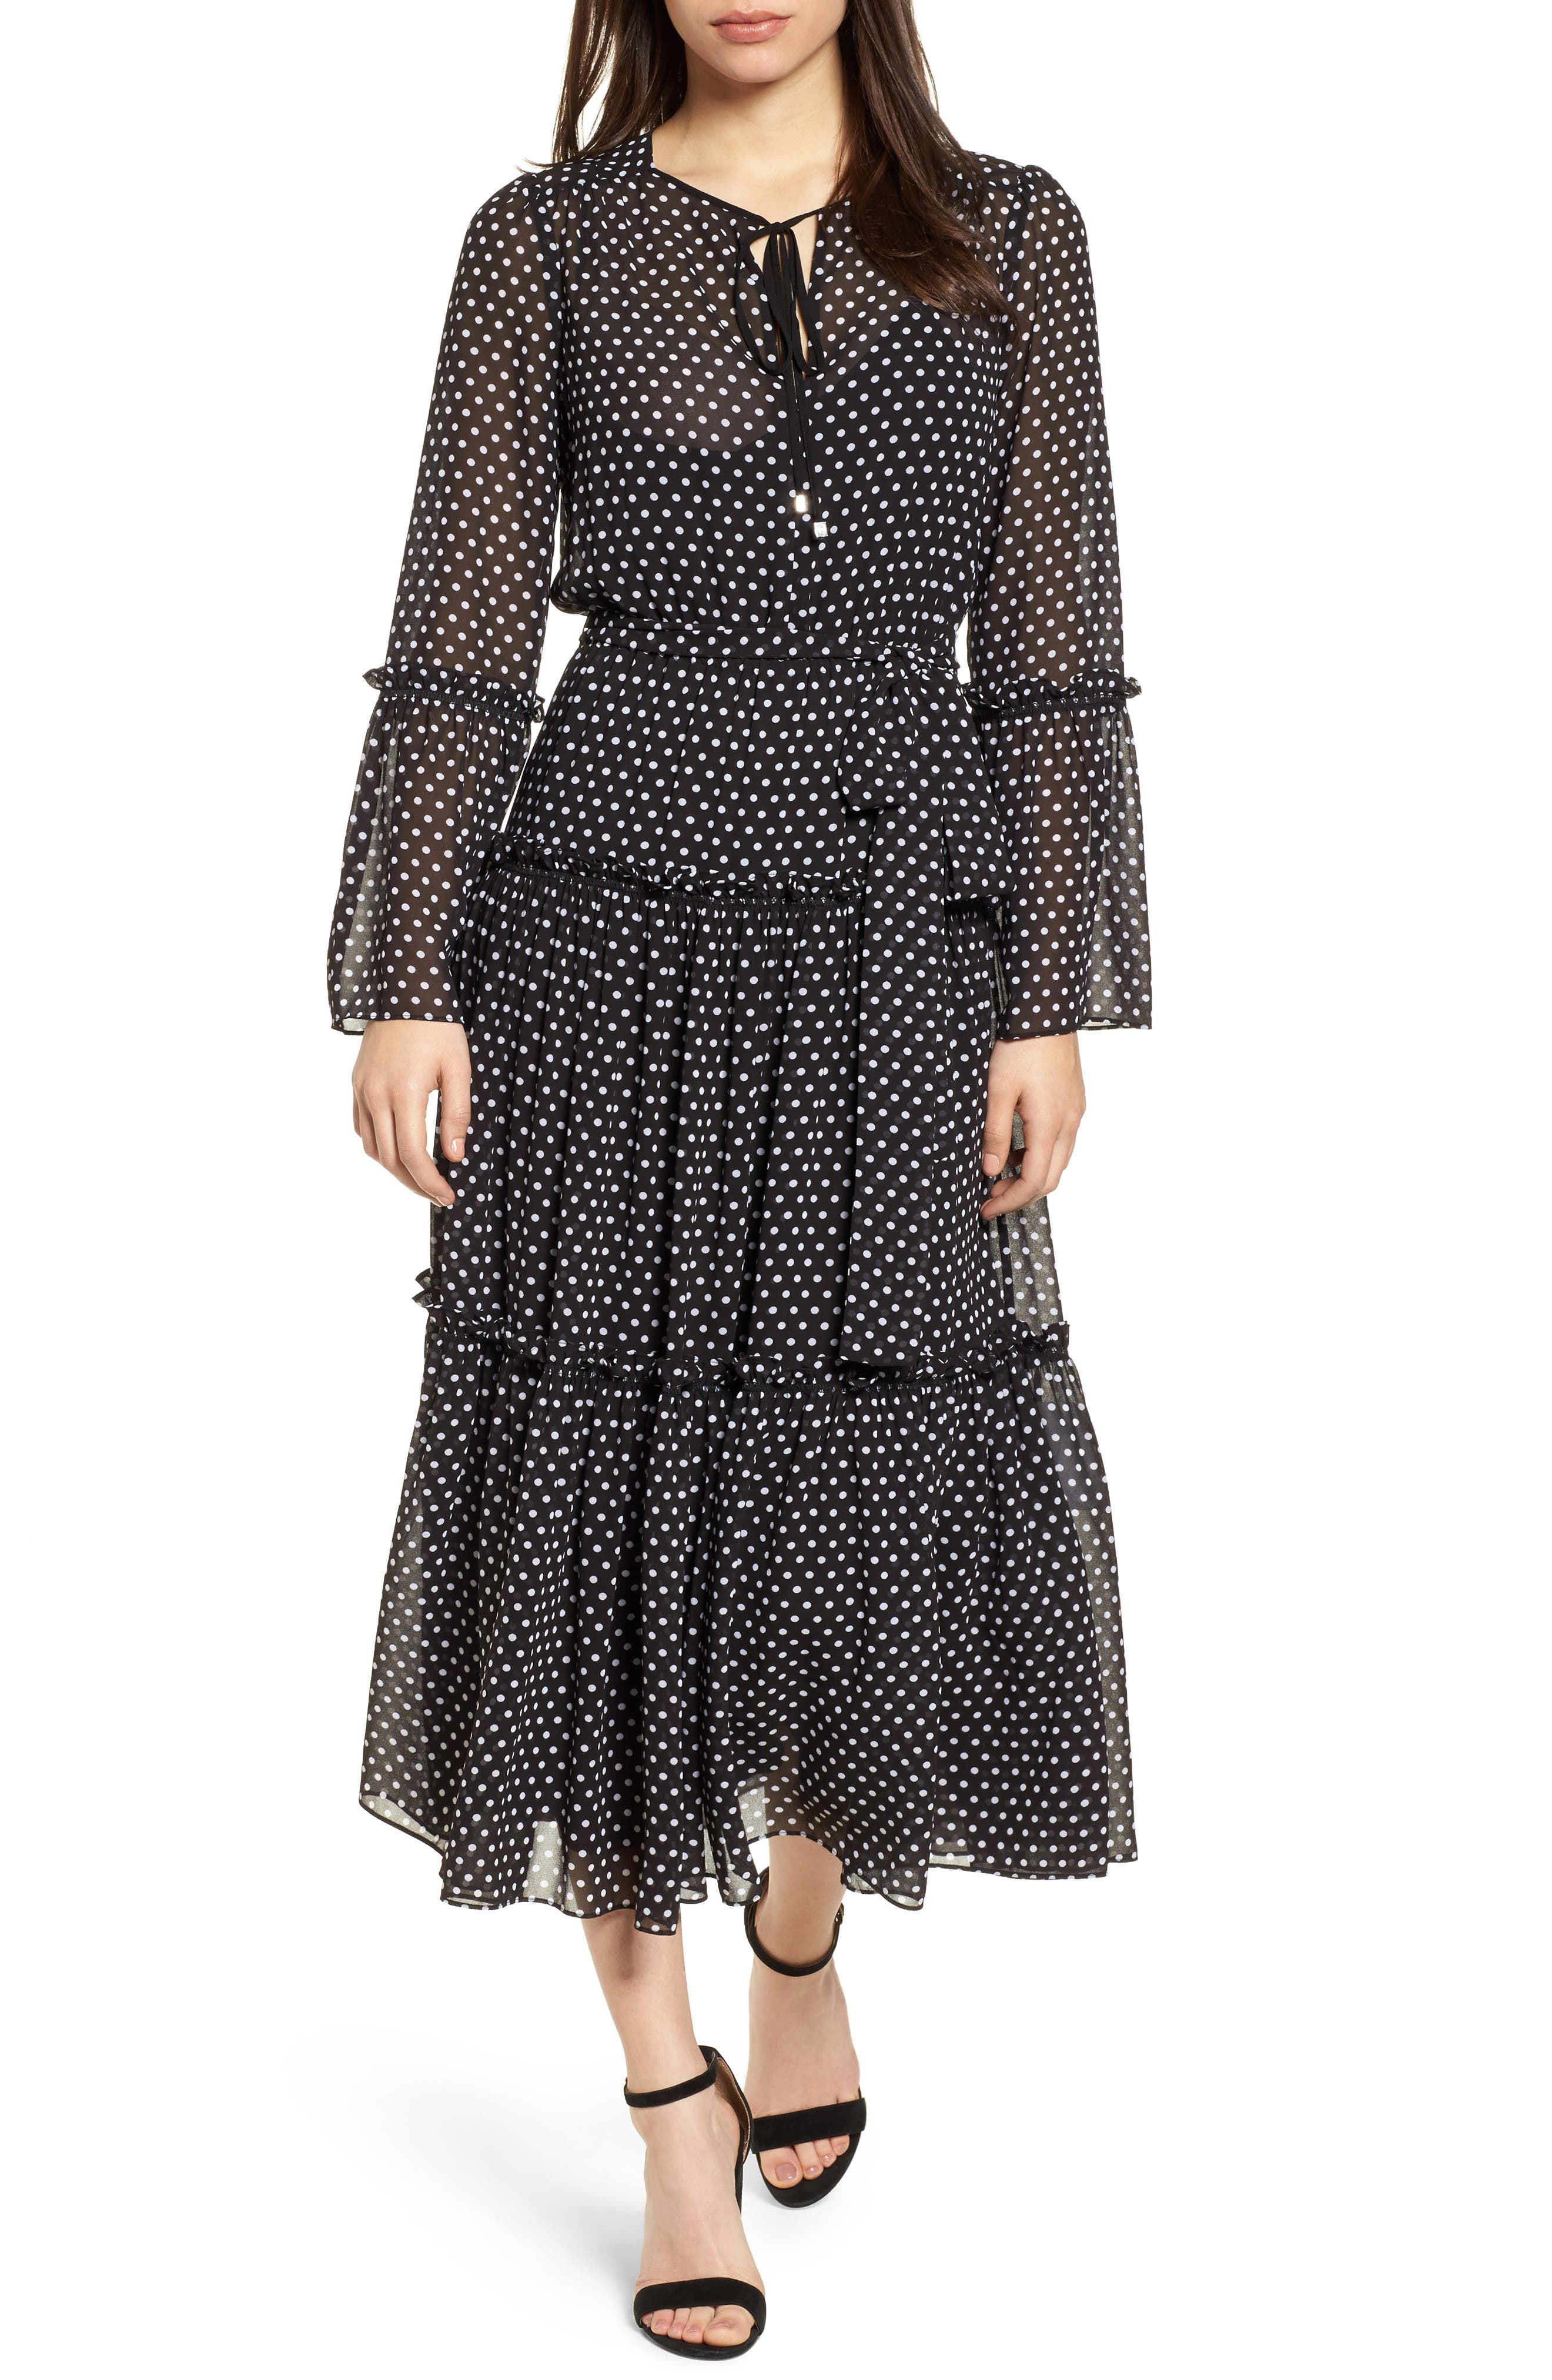 MICHAEL Michael Kors Tiered Dot Boho Dress